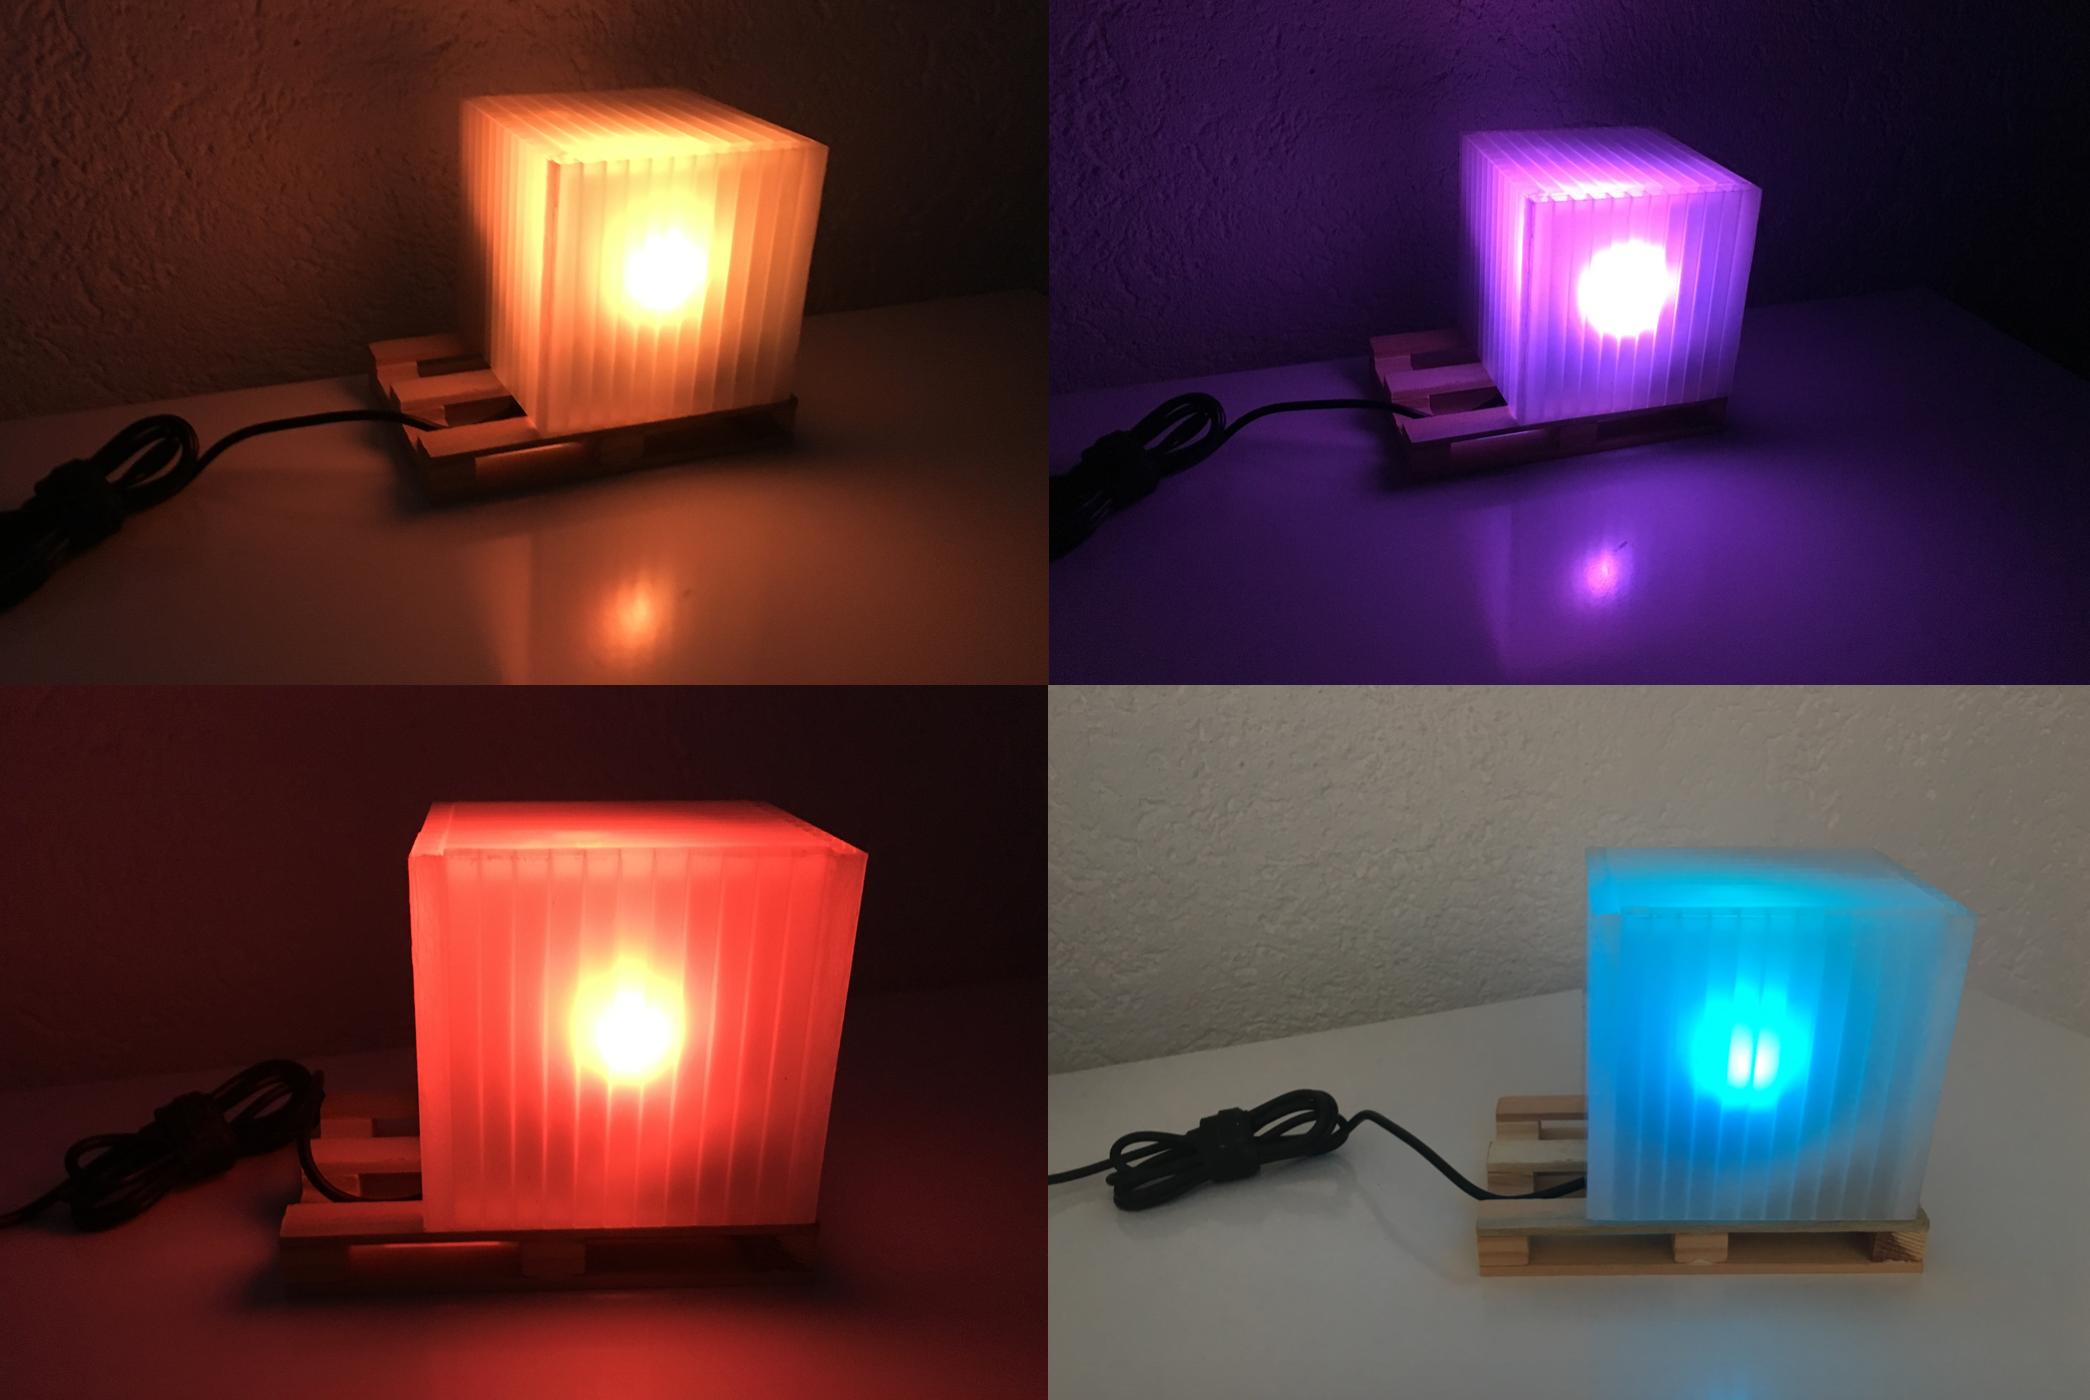 First Boxy prototypes